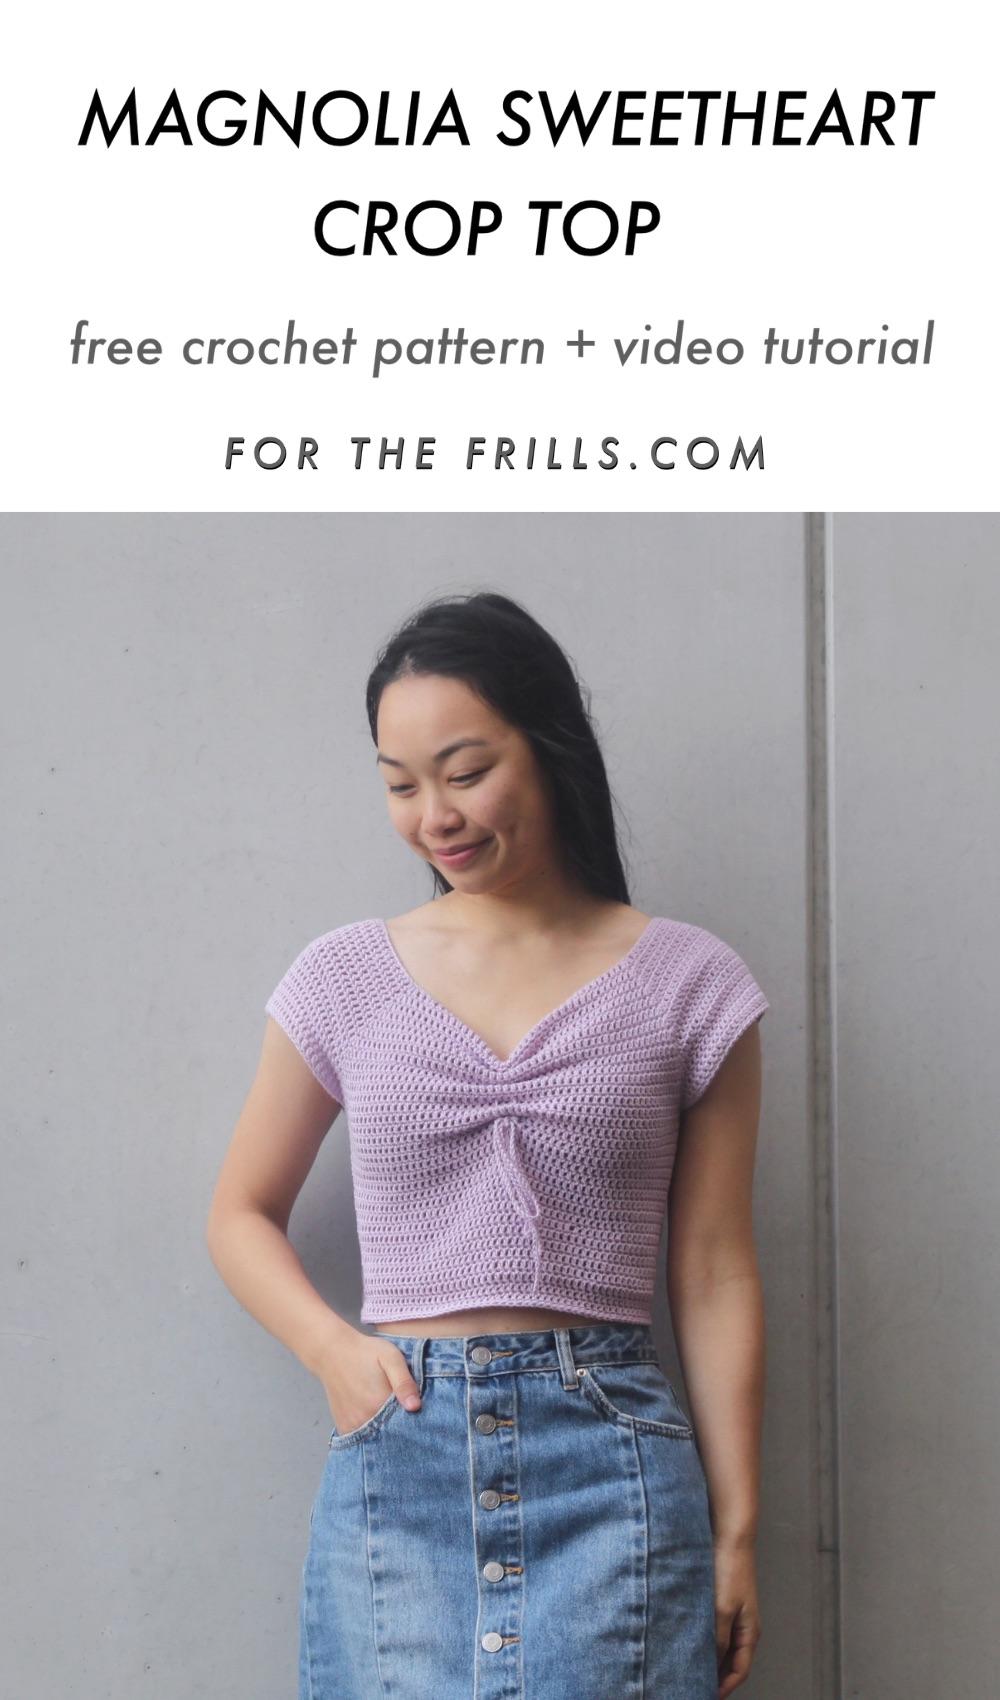 pin image of sweetheart crop top crochet pattern